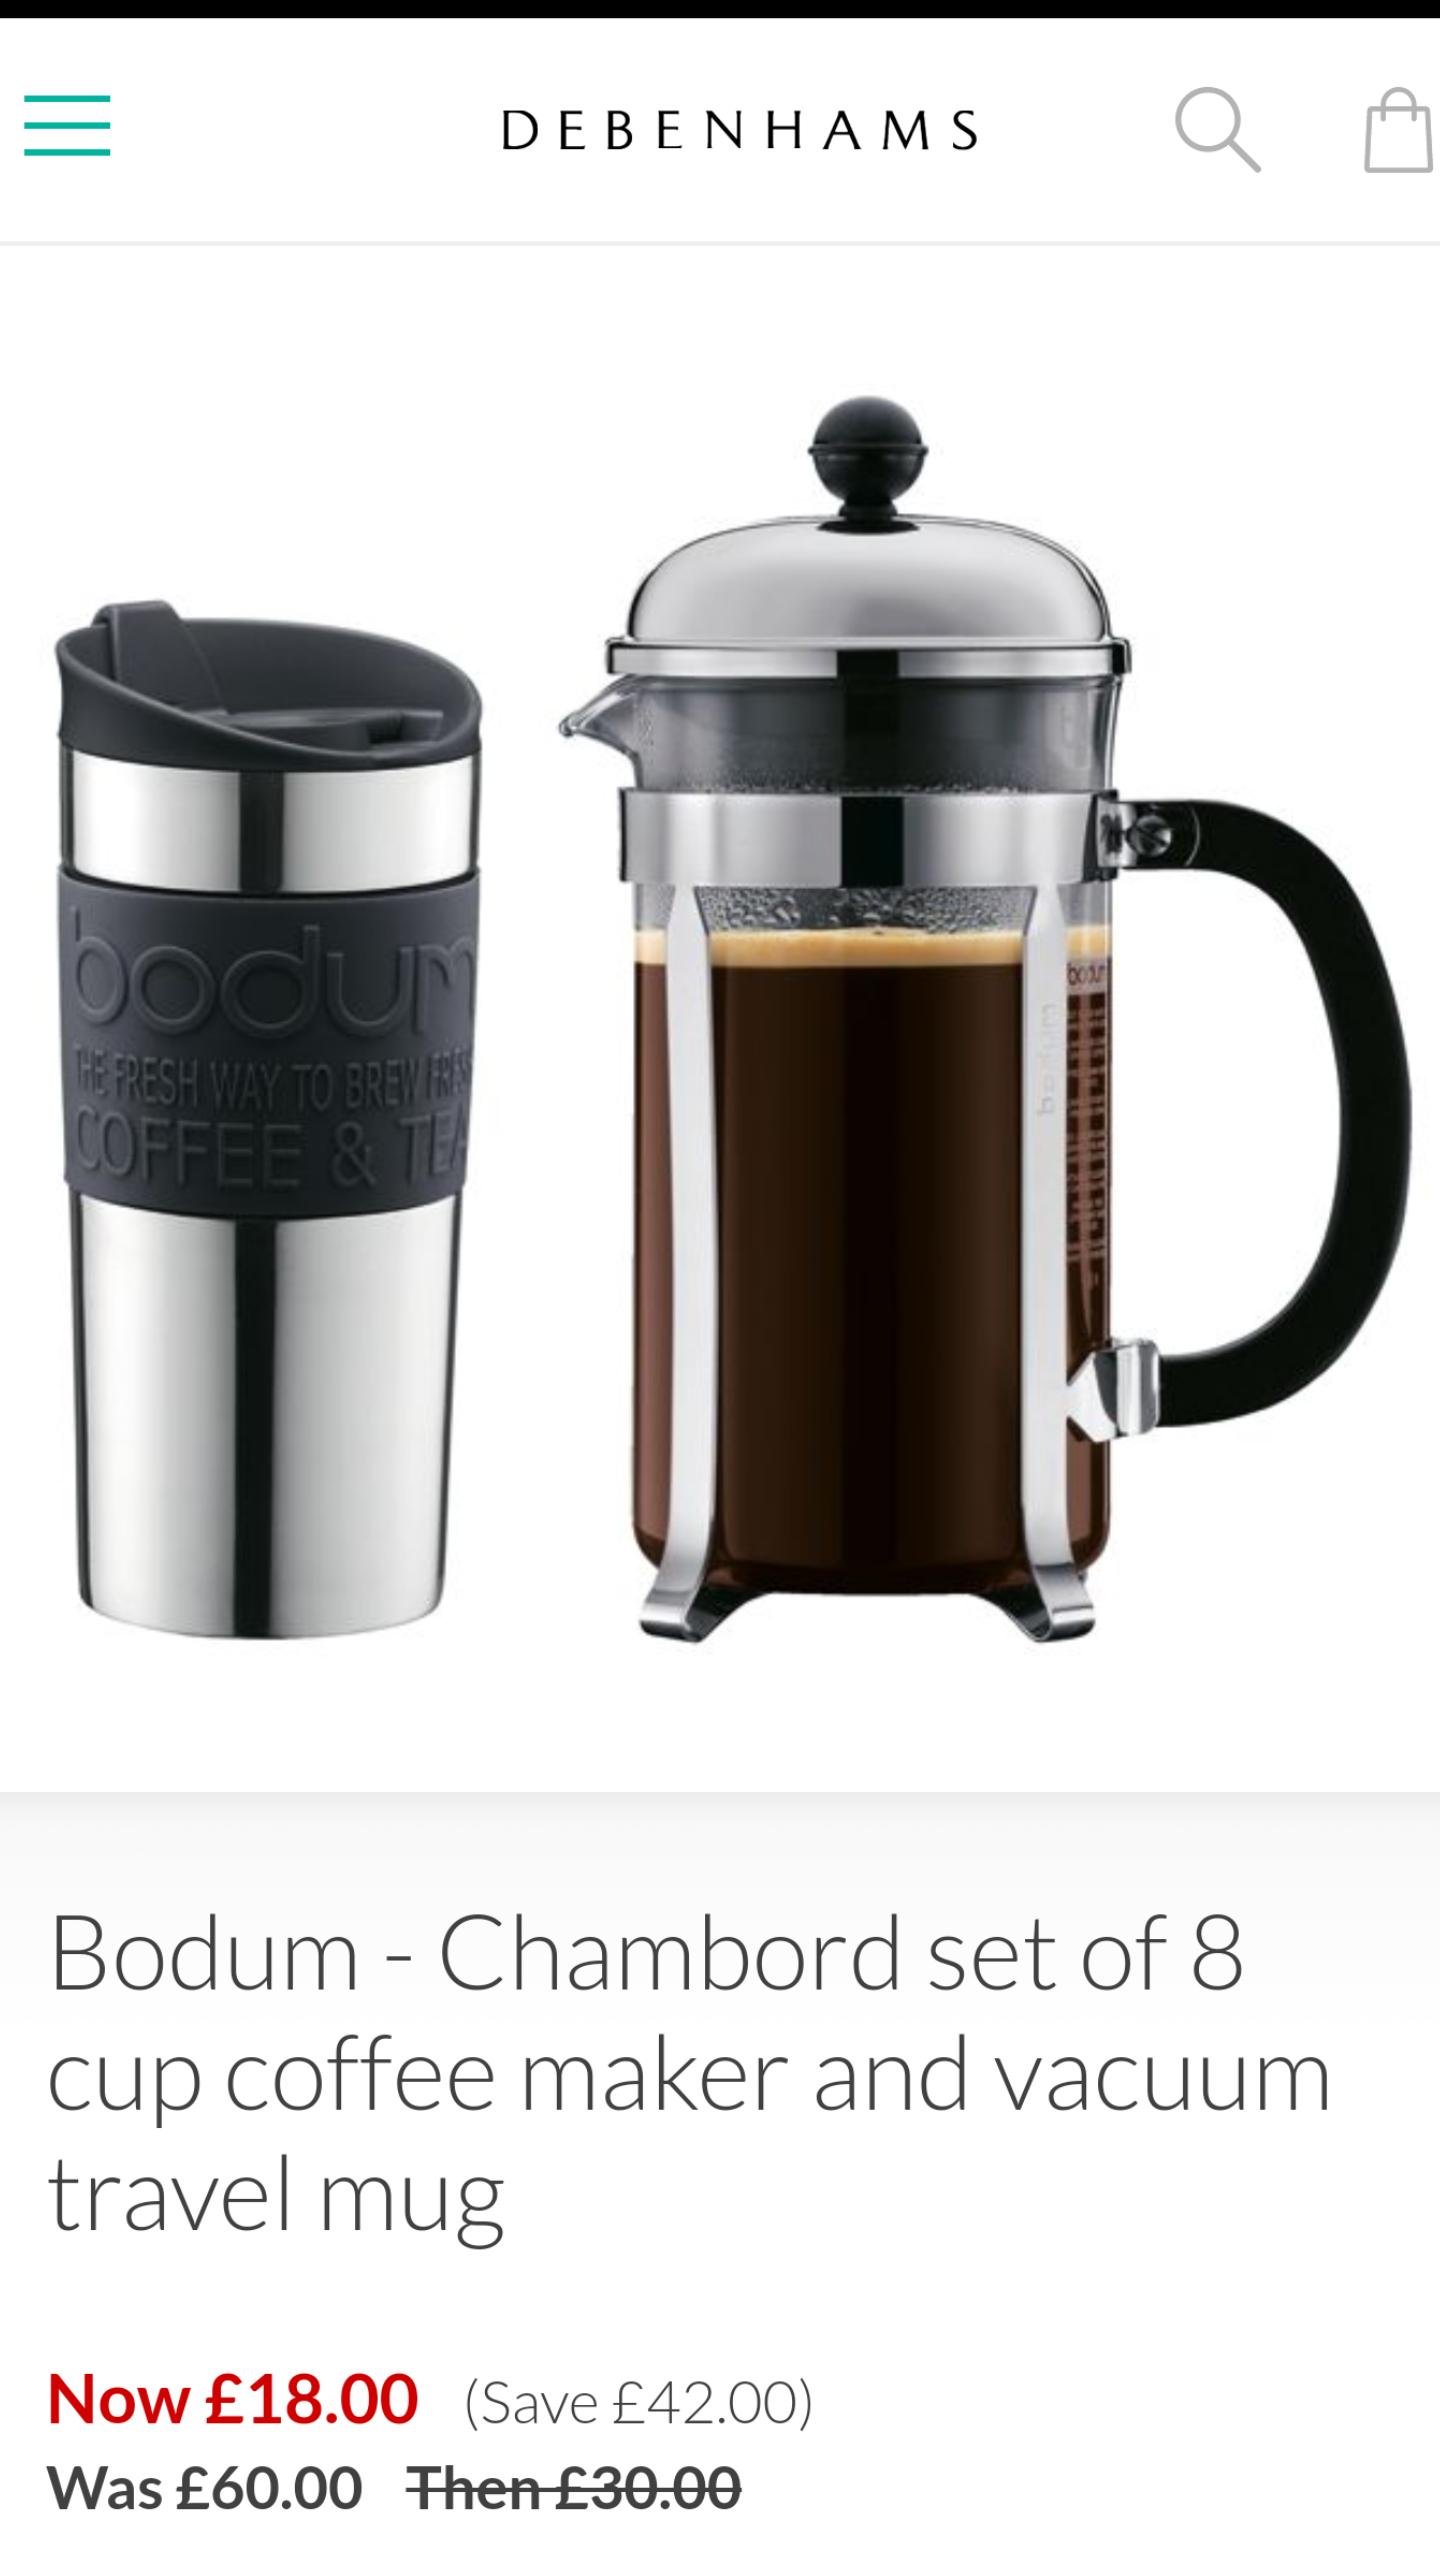 Bodum-Chambord set of 8 cup coffee maker and vacuum travel mug - Debenhams - £18